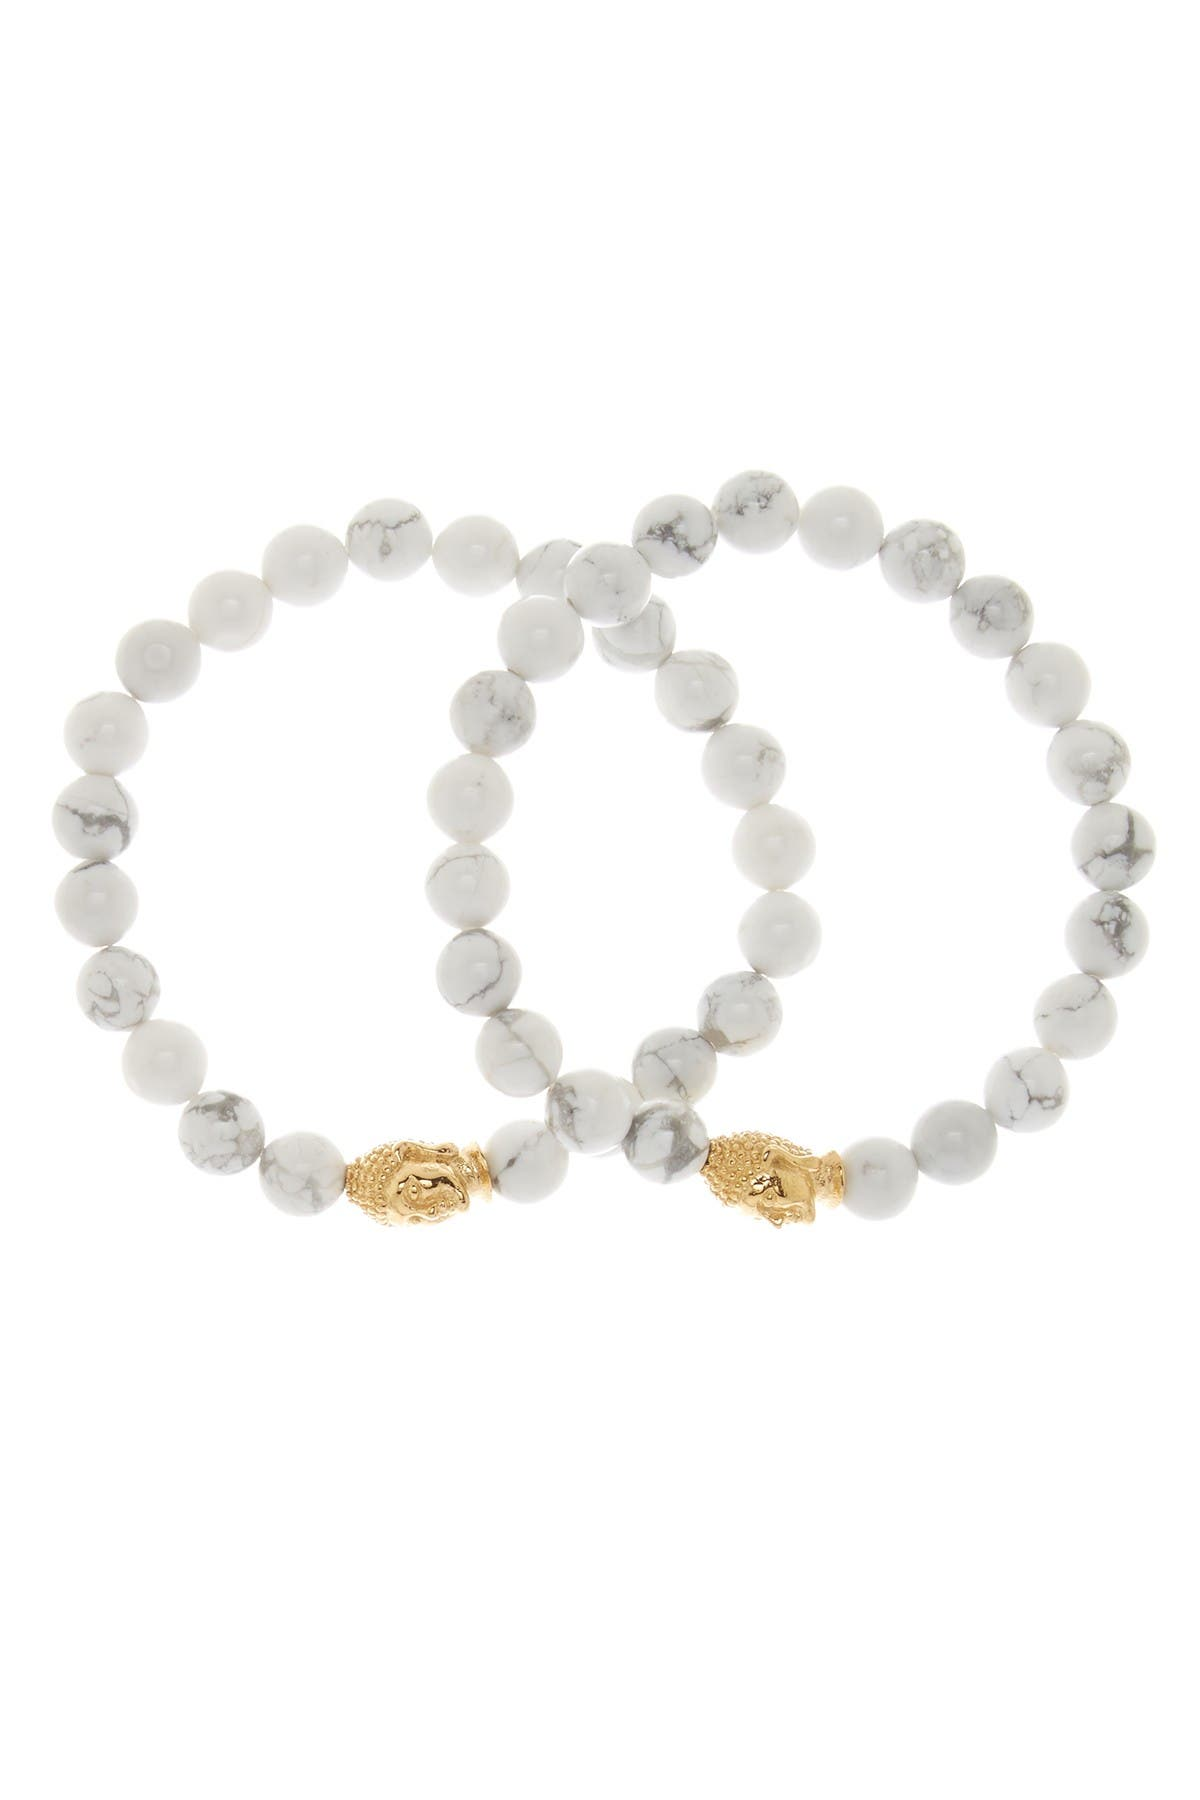 Image of Marz The Marbled Tranquility Bracelet Set